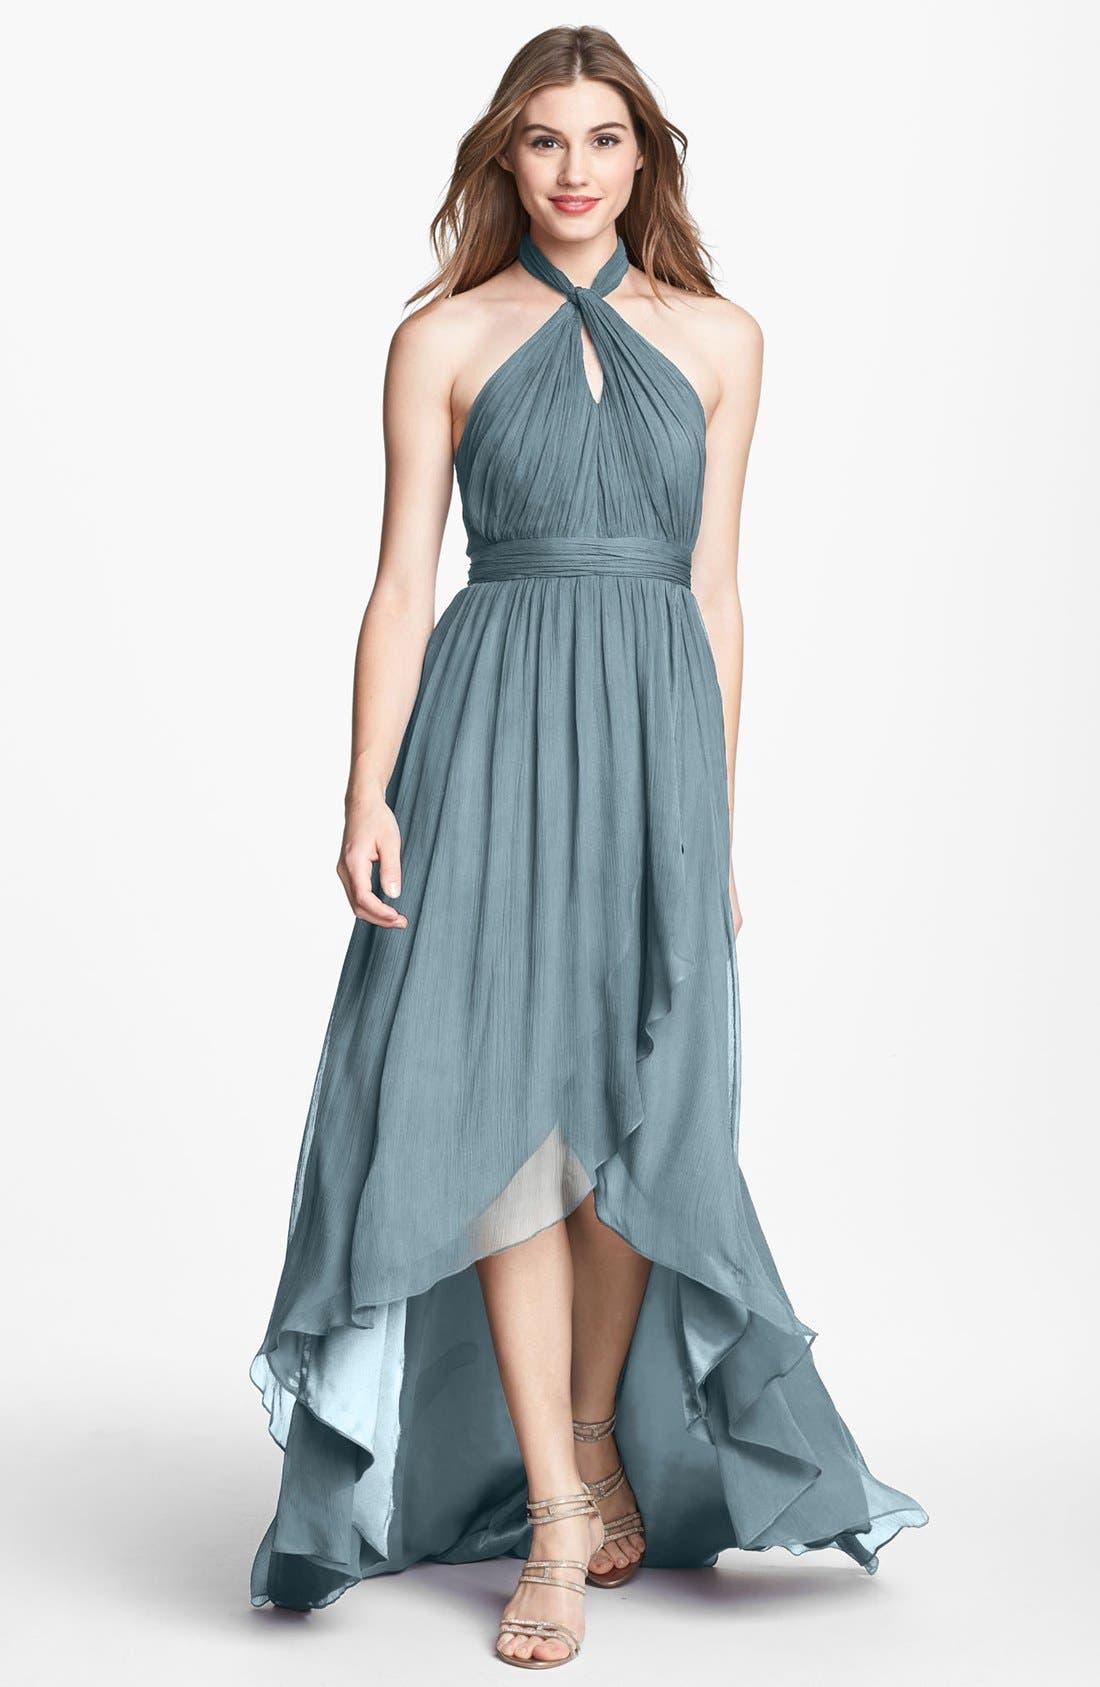 Main Image - Jenny Yoo 'Olivia' Crinkled Chiffon High/Low Halter Dress (Online Only)